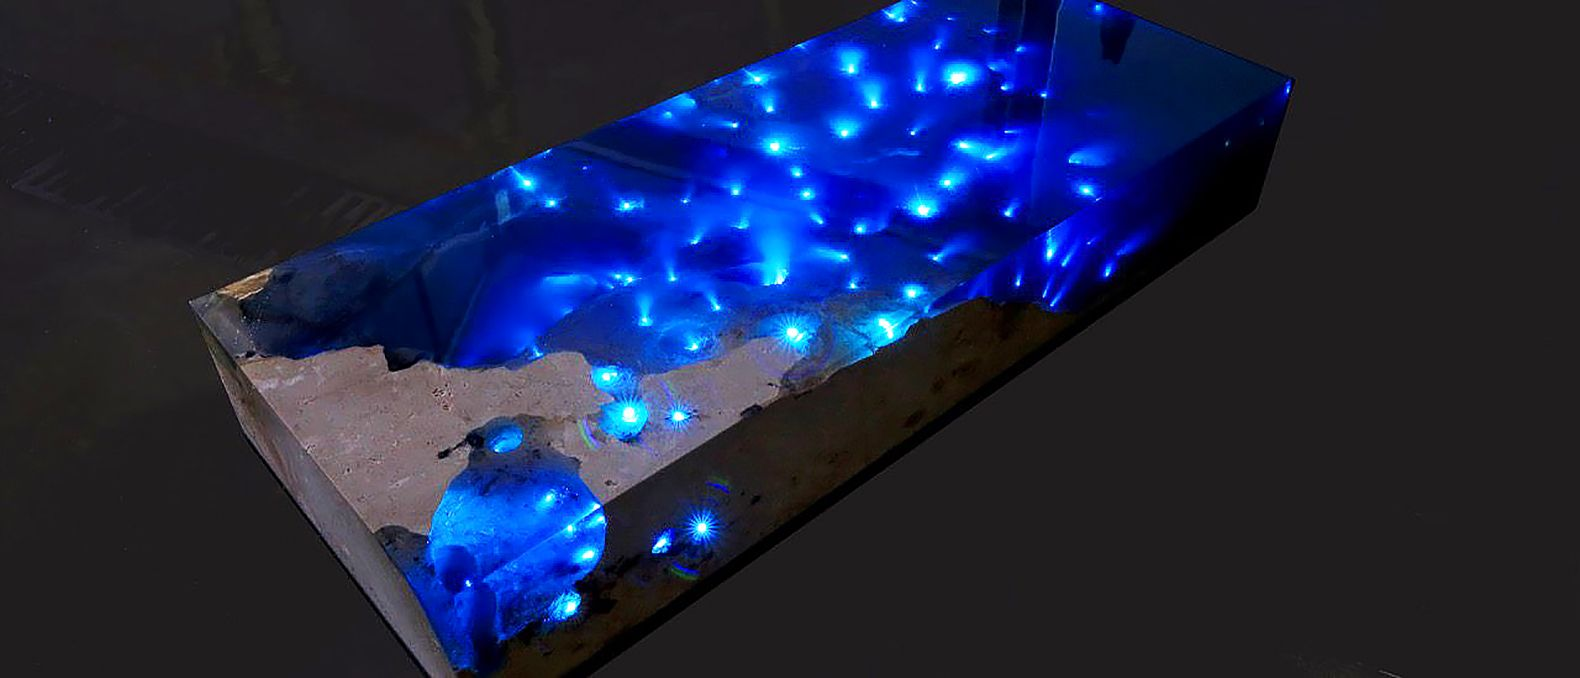 Mesmerizing Resin Table Illuminates A Starry Sea With